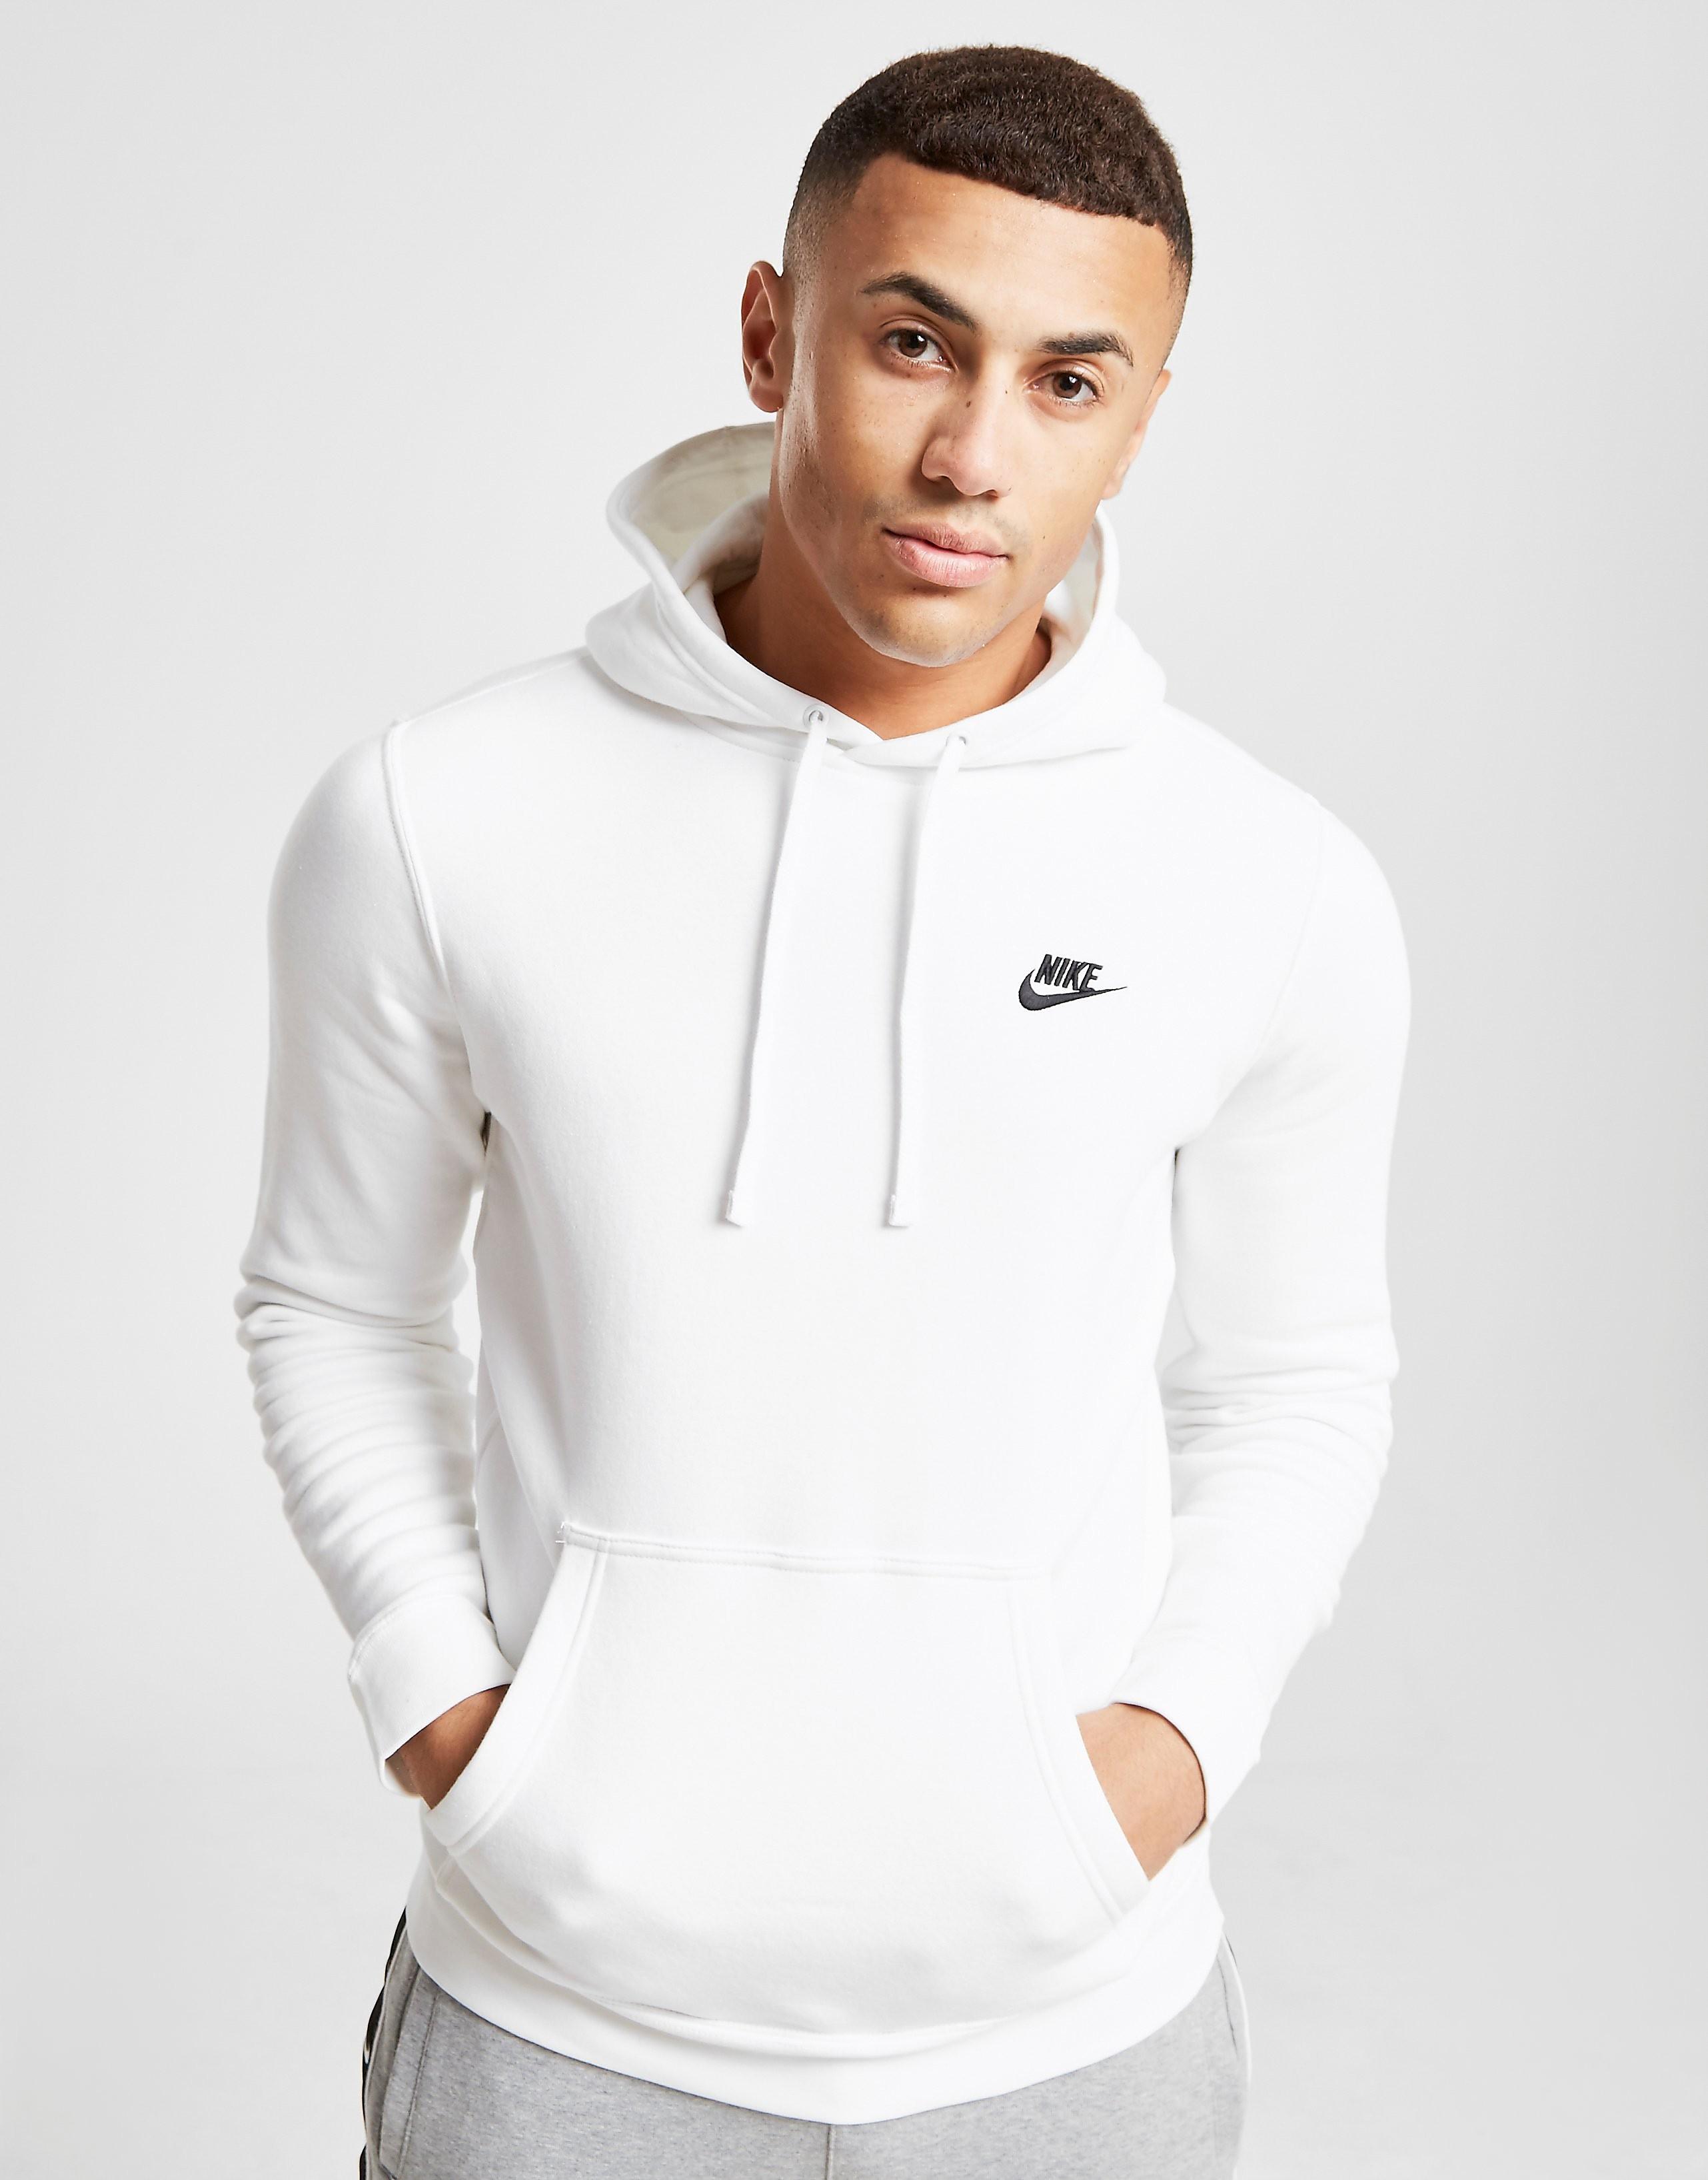 Nike Sweat Foundation Homme